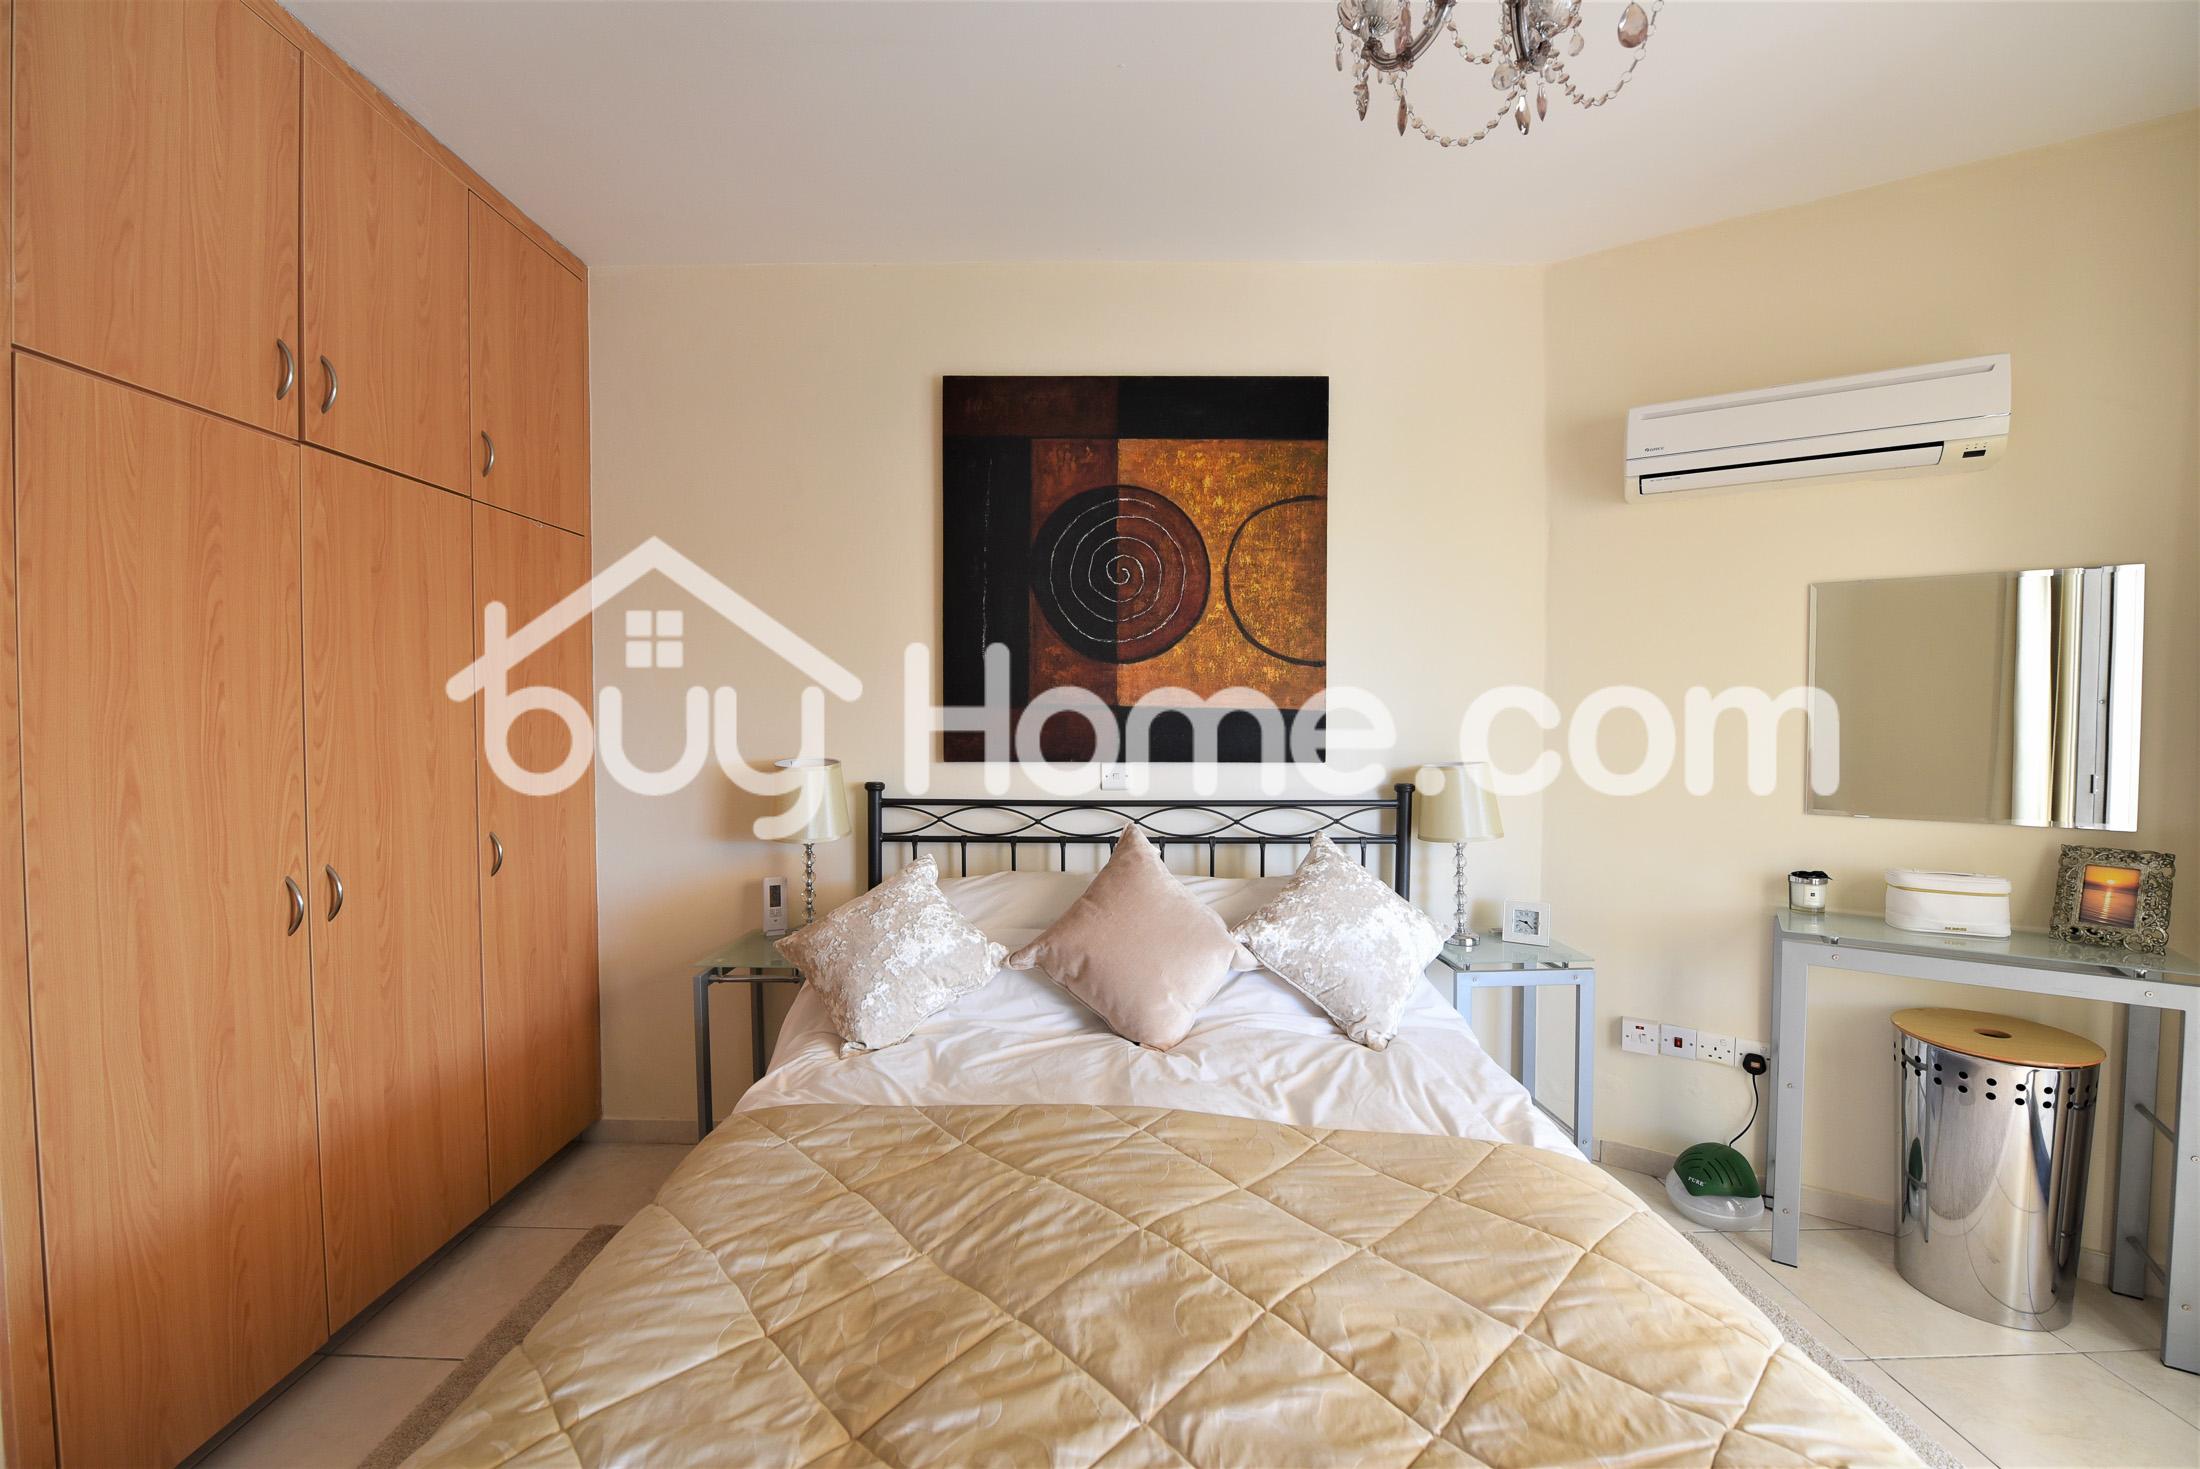 1 Bedroom Ground floor Apartment | BuyHome